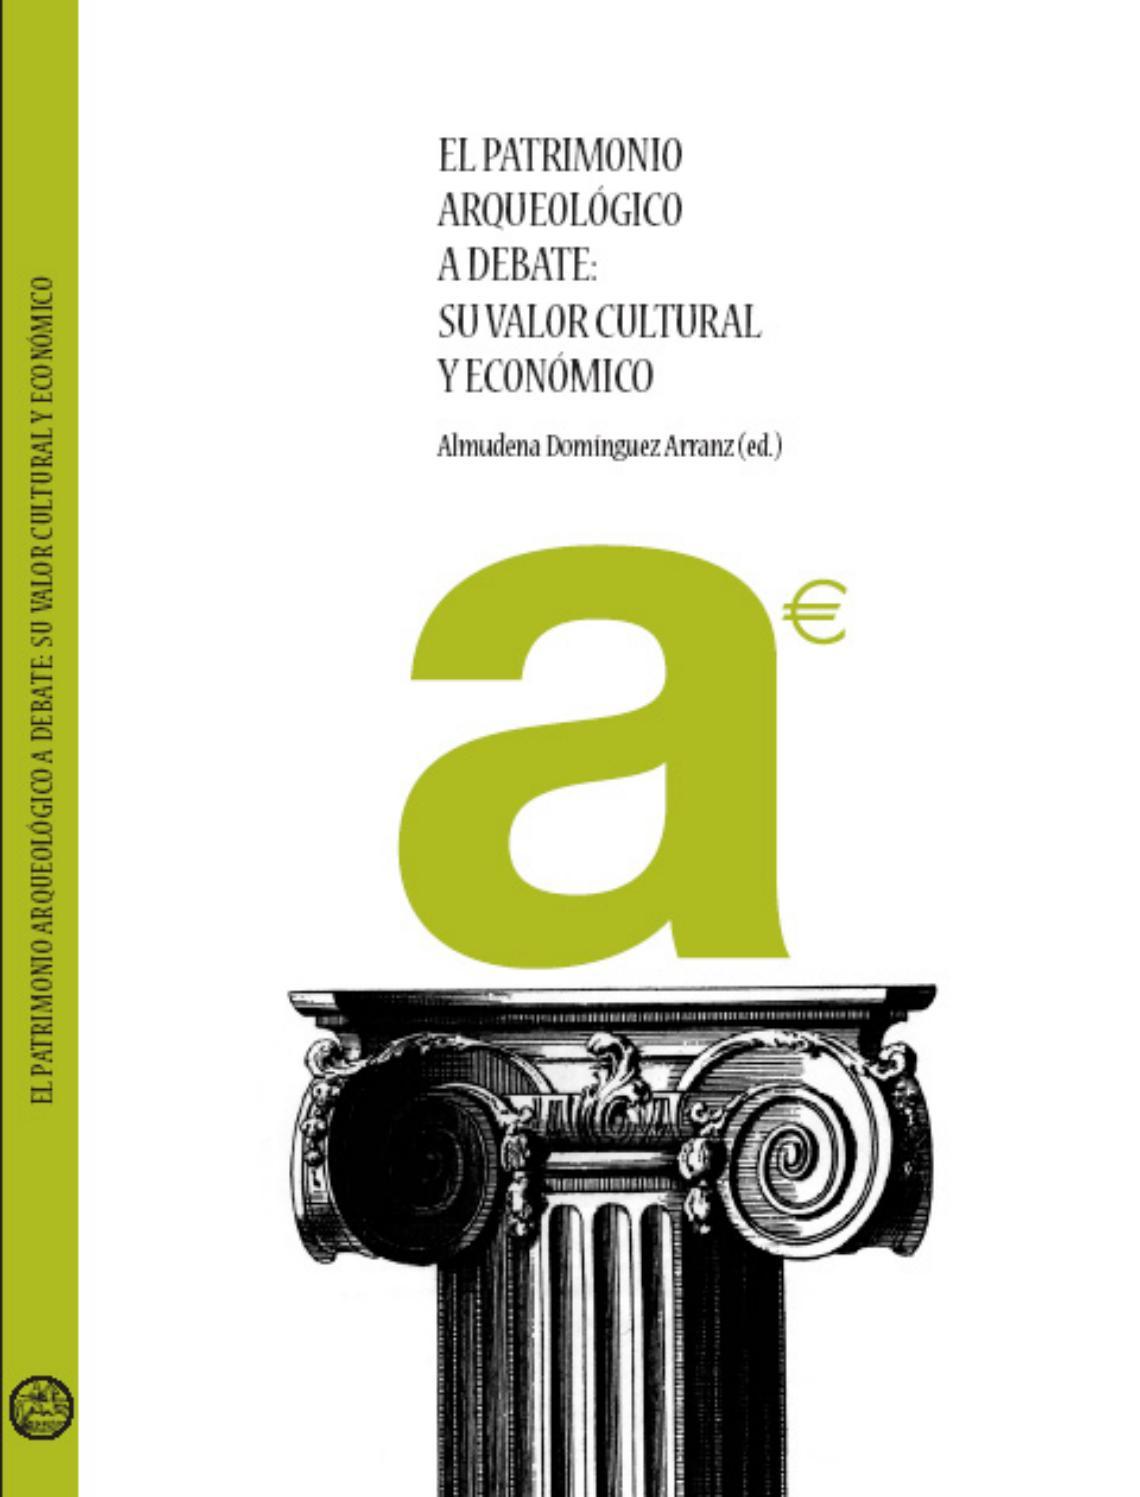 Patrimonio arqueológico a debate by Diputación Provincial de Huesca ...